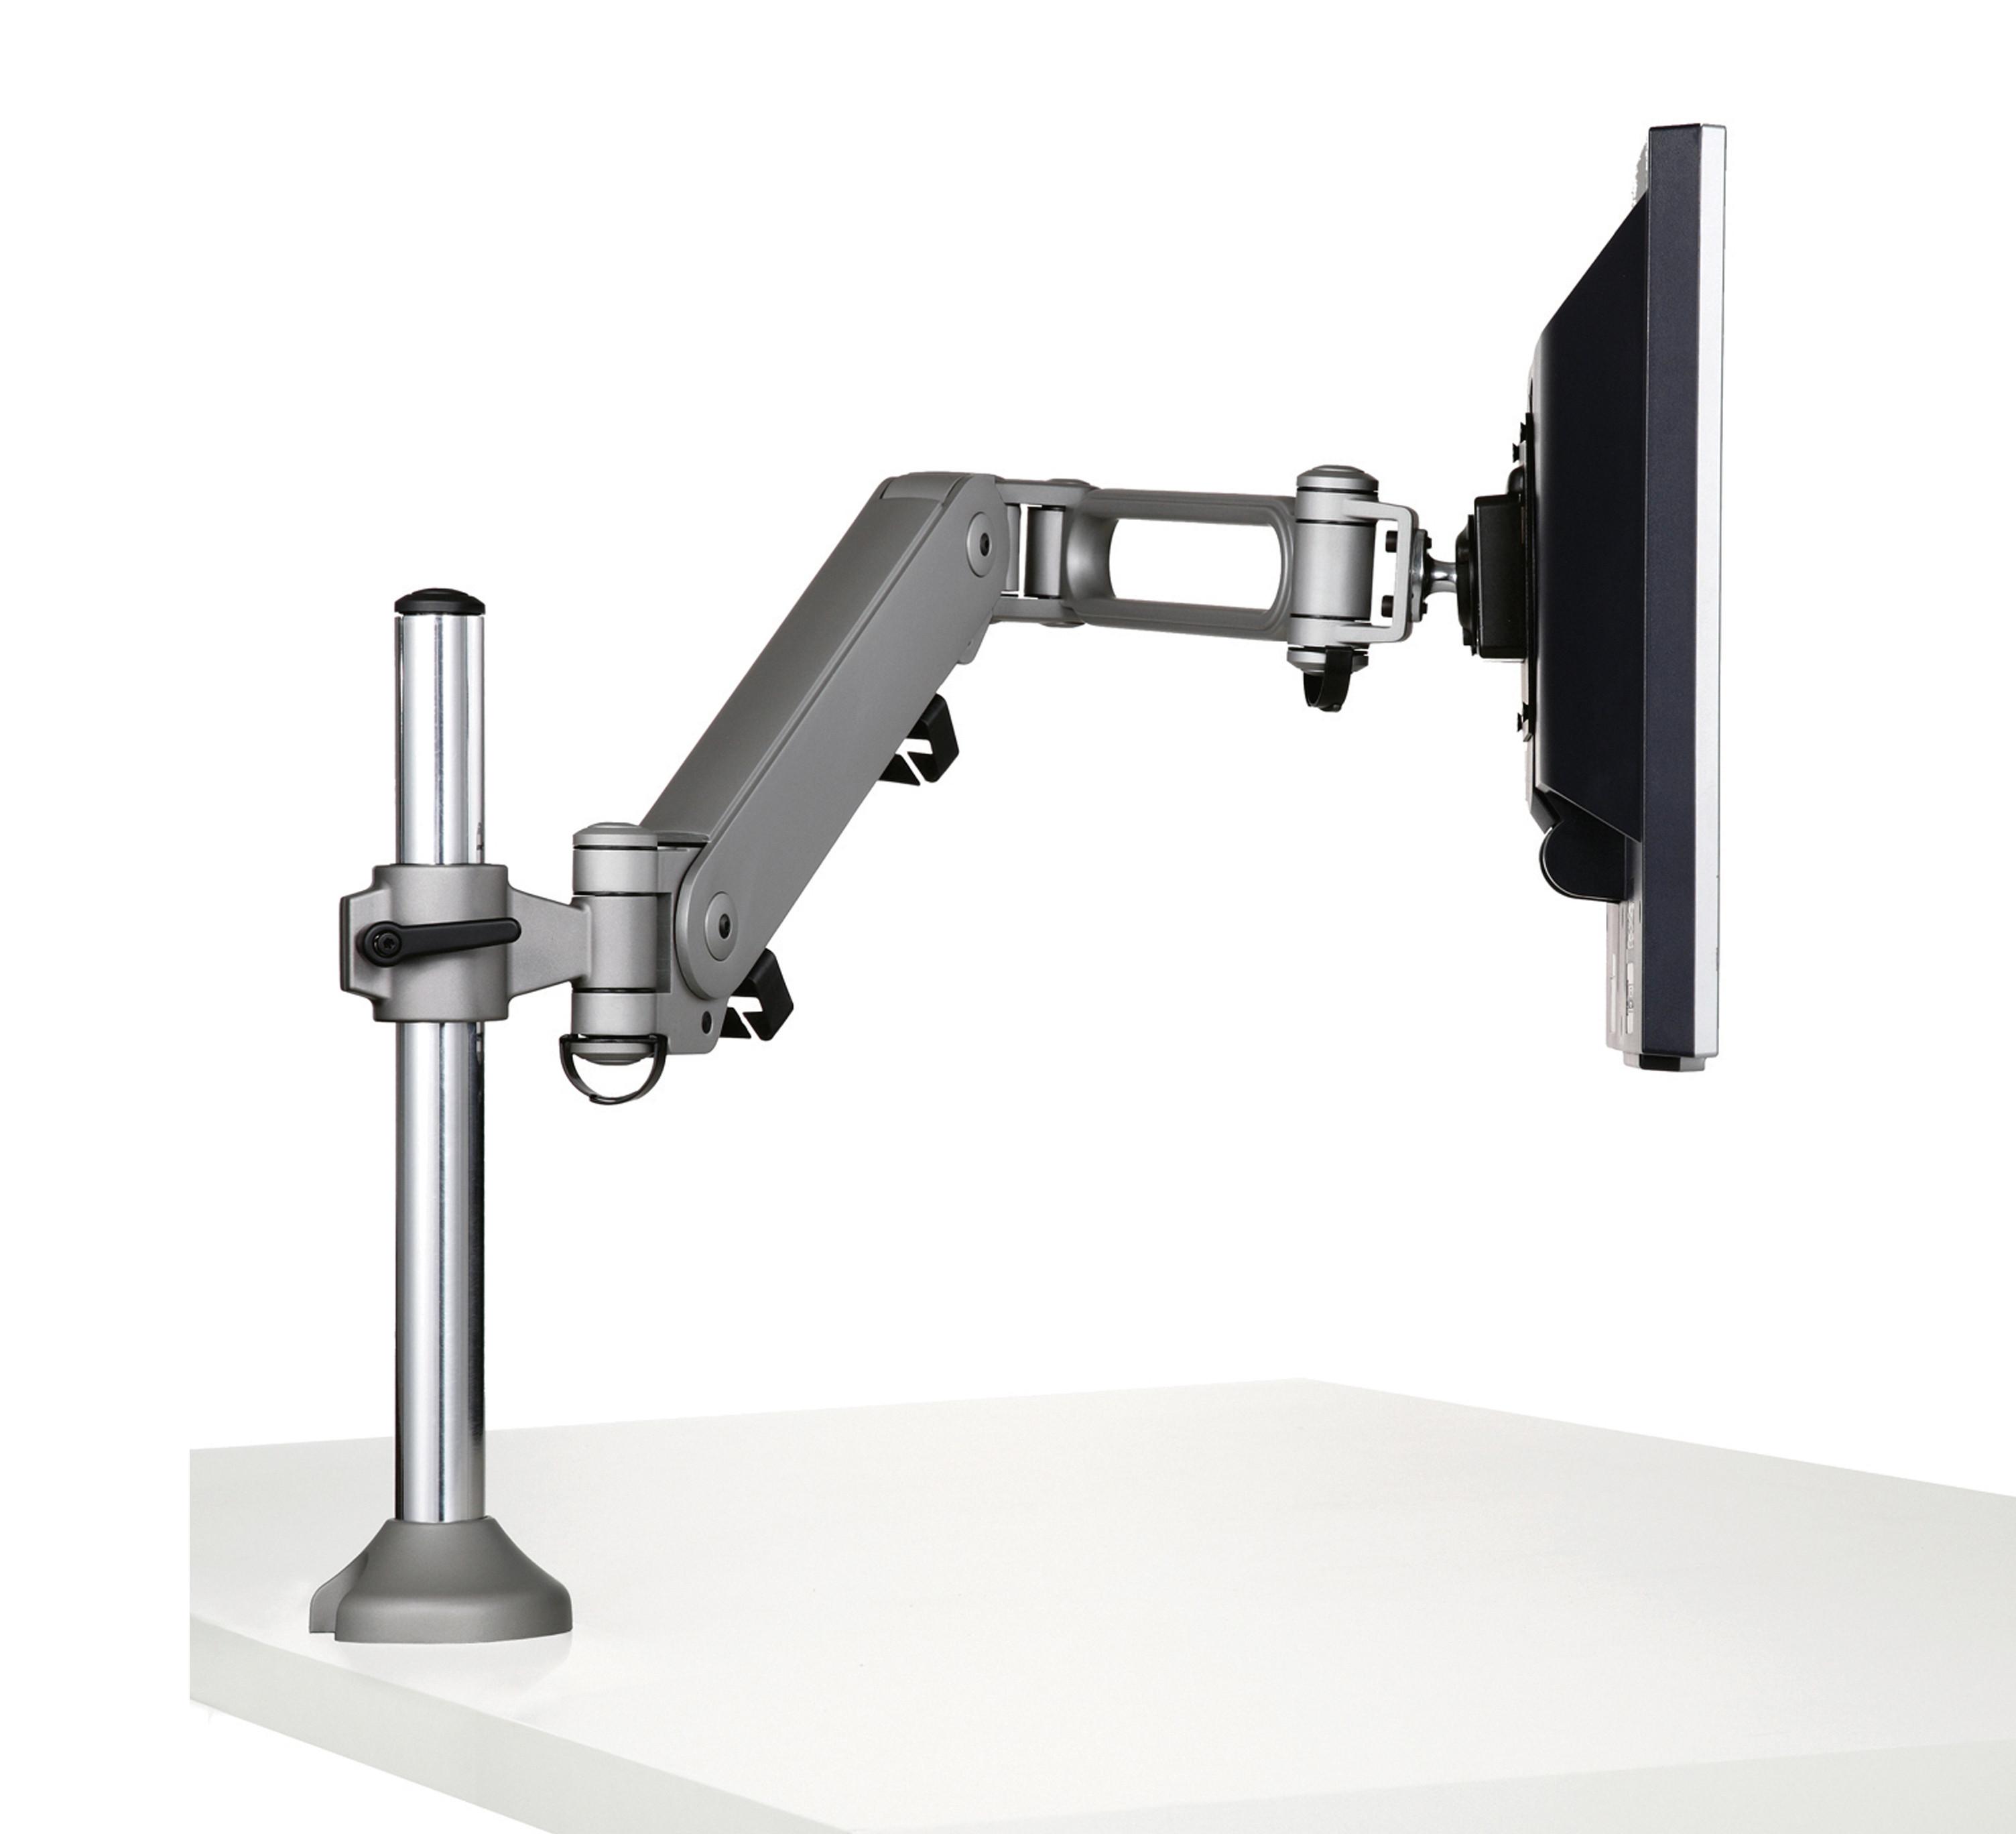 M4 Monitor Arm X